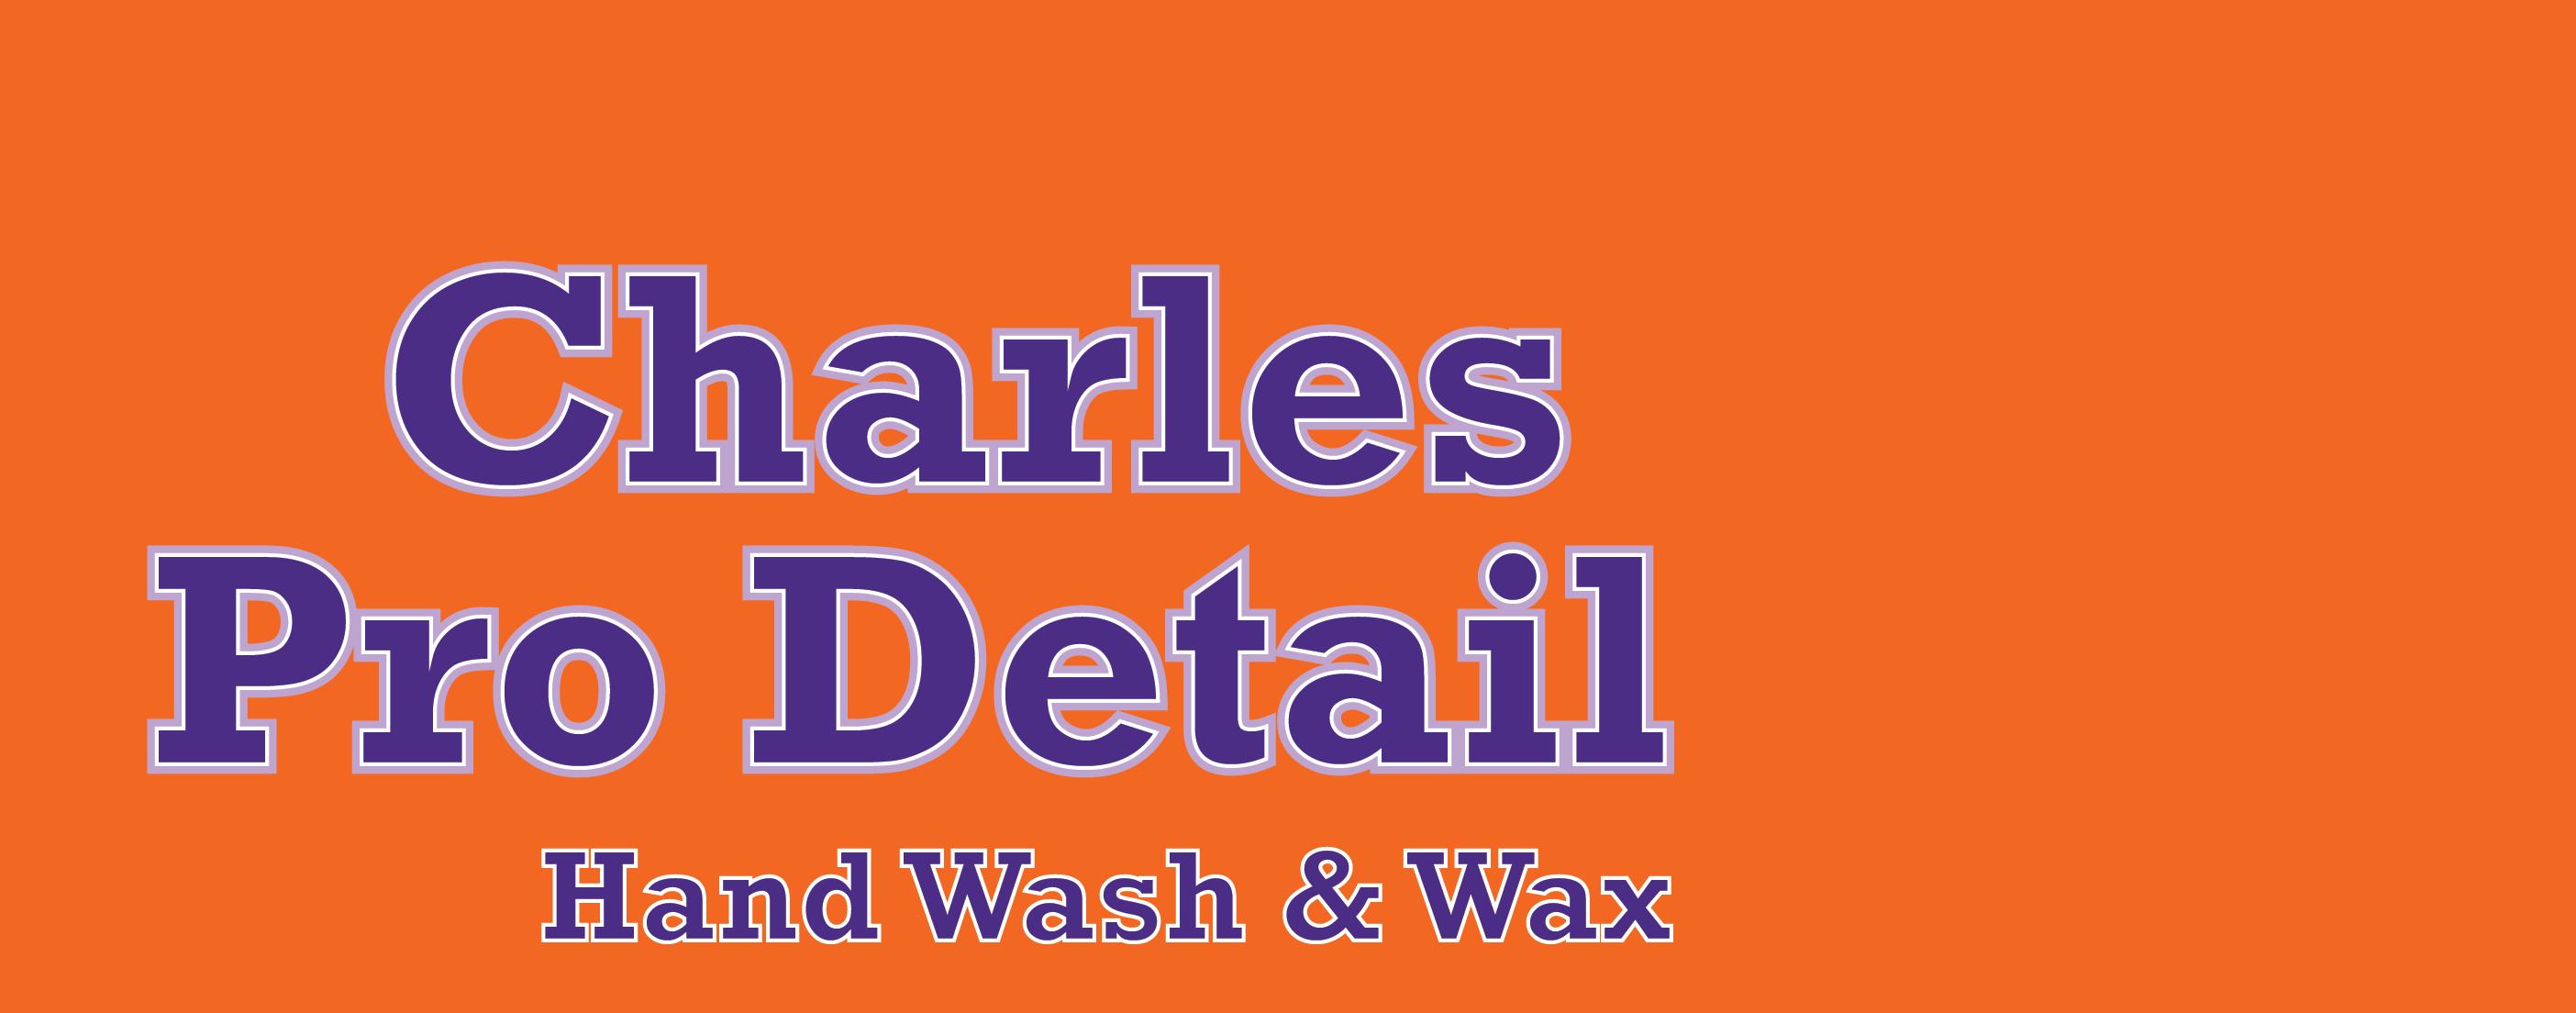 charles-professonal-detail-logo-image